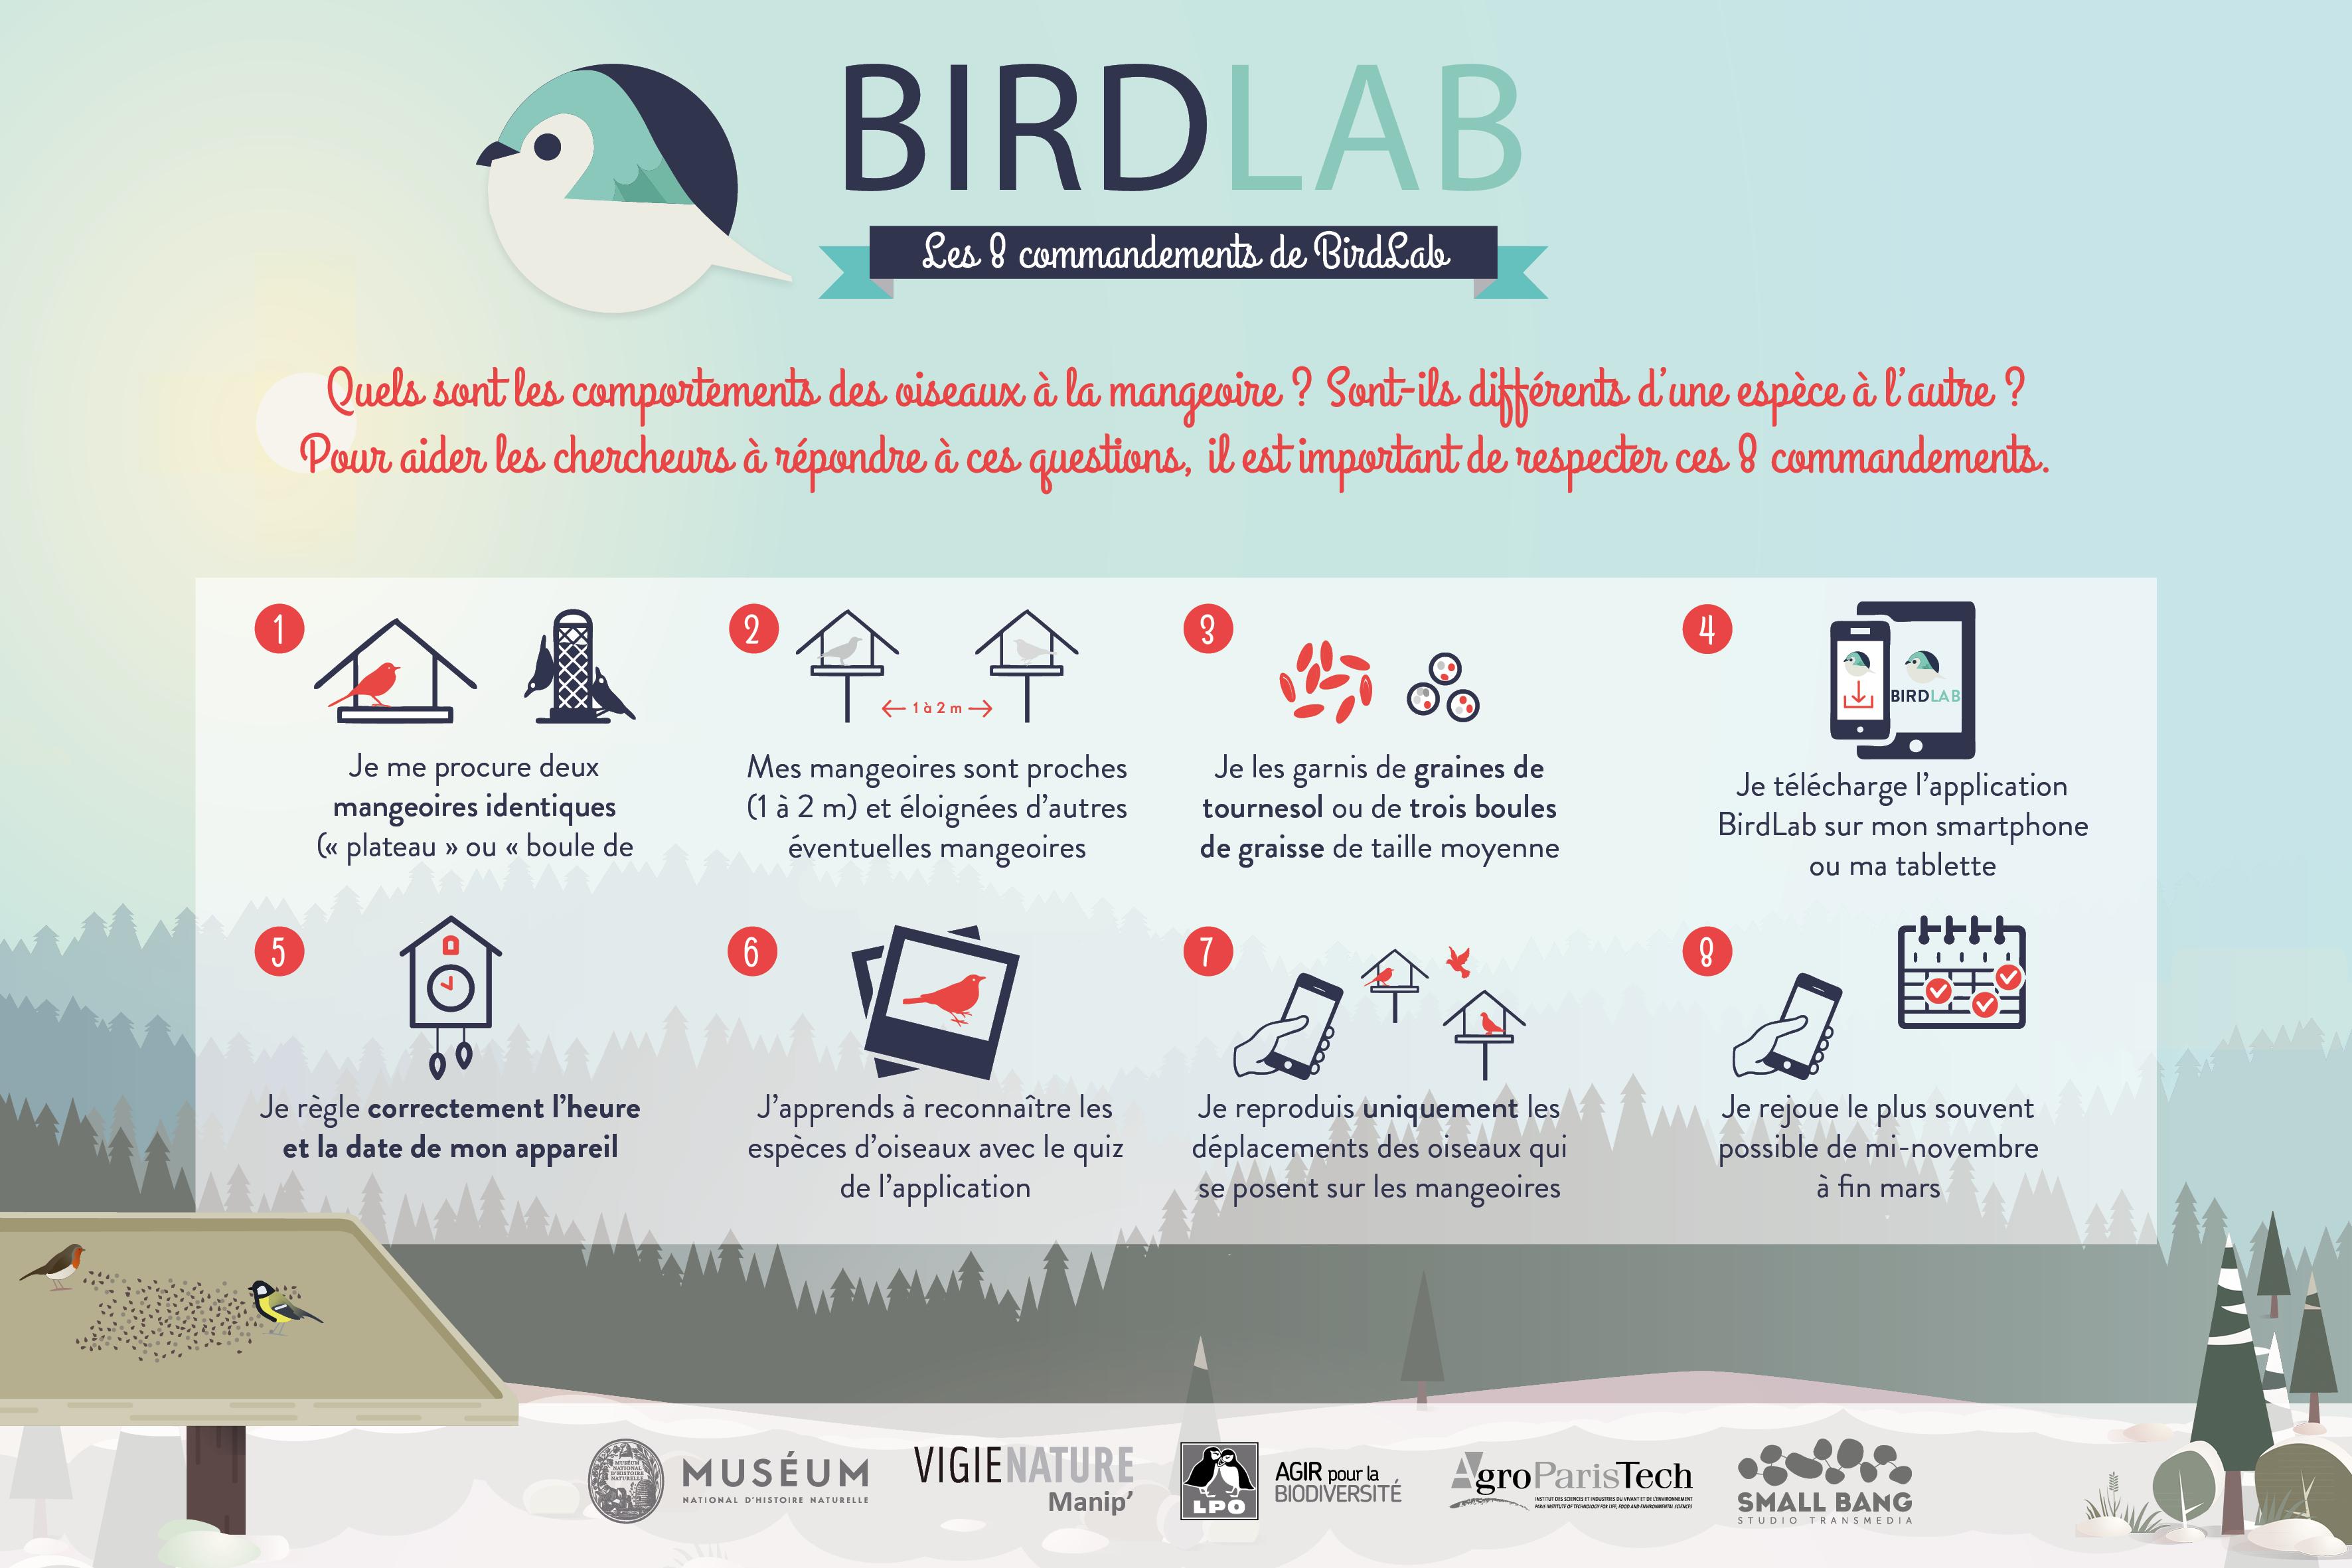 panneau_commandements_BirdLab.jpg